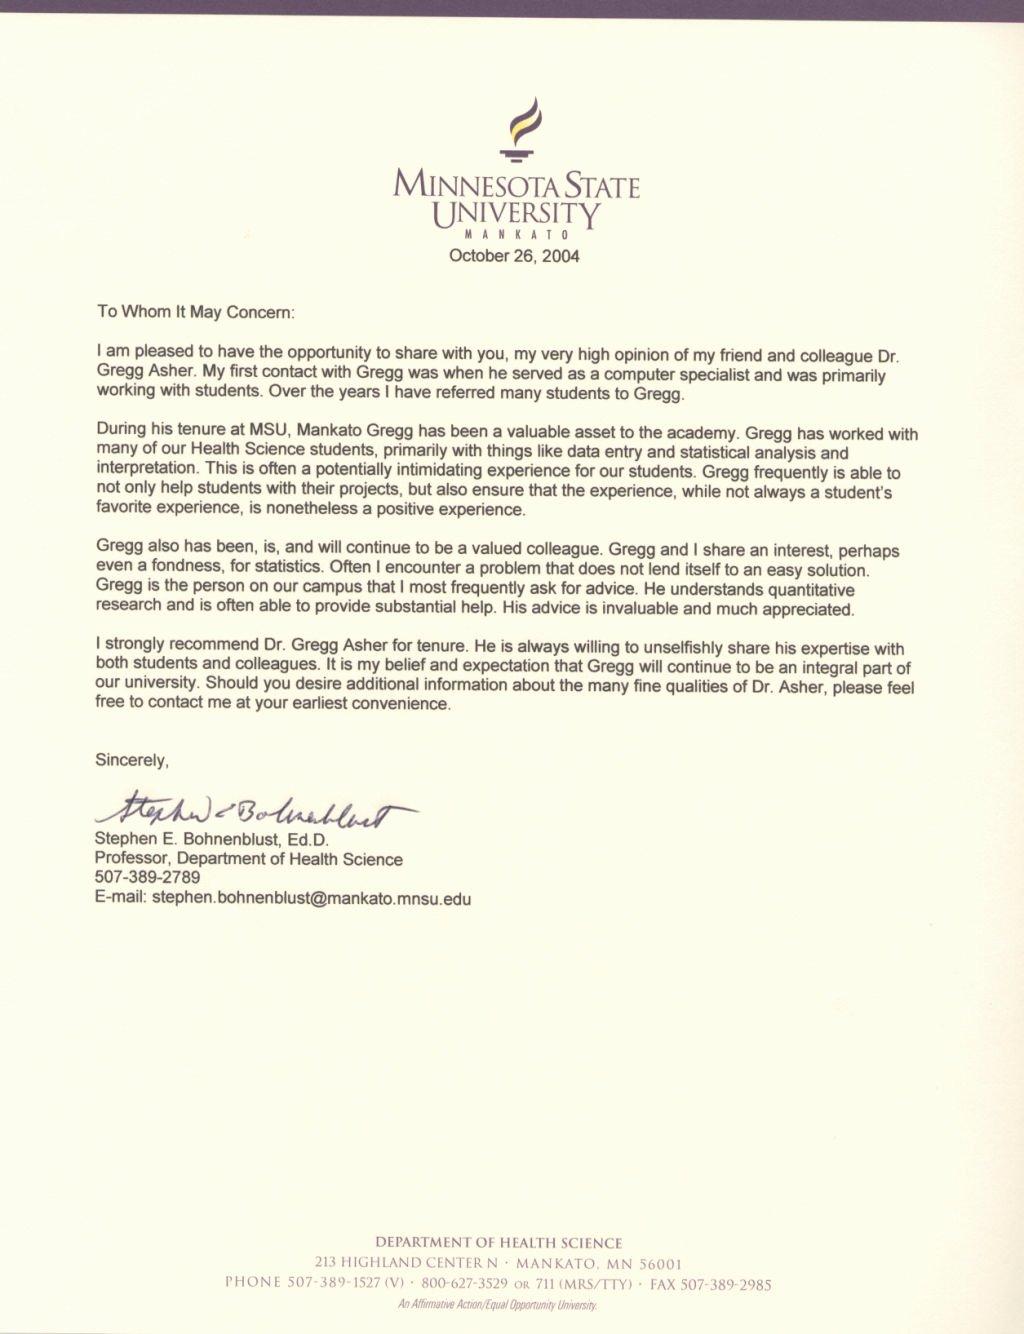 Dandy Letter Support for Professor – Letter format Writing